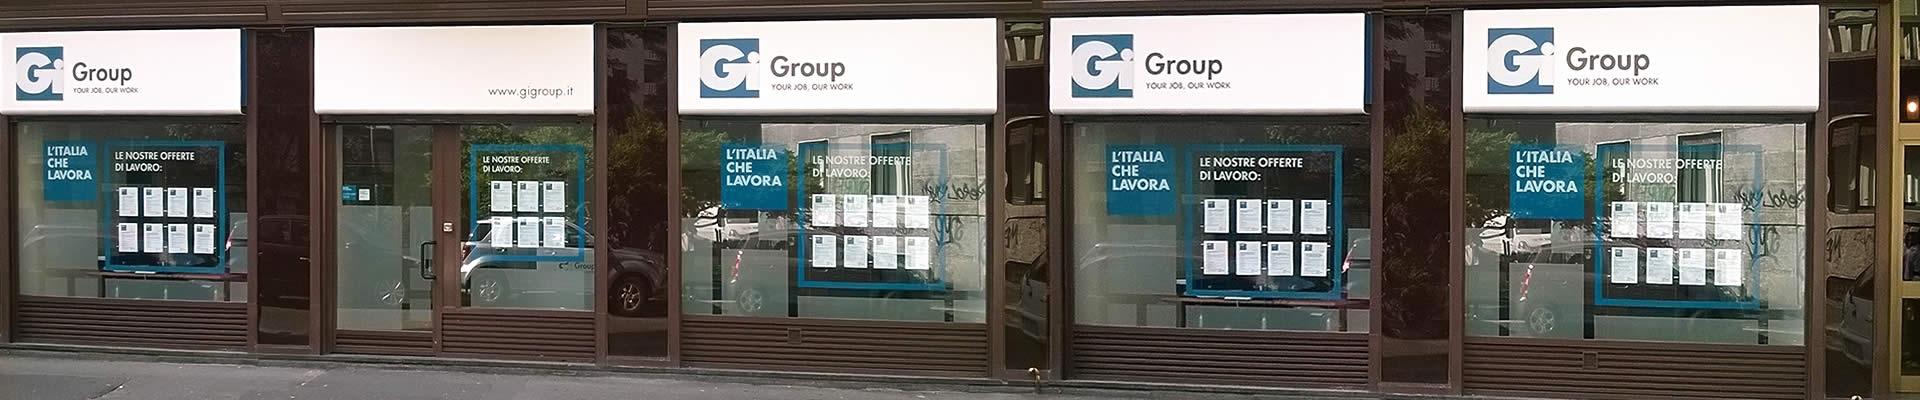 Gi Group - Filiali